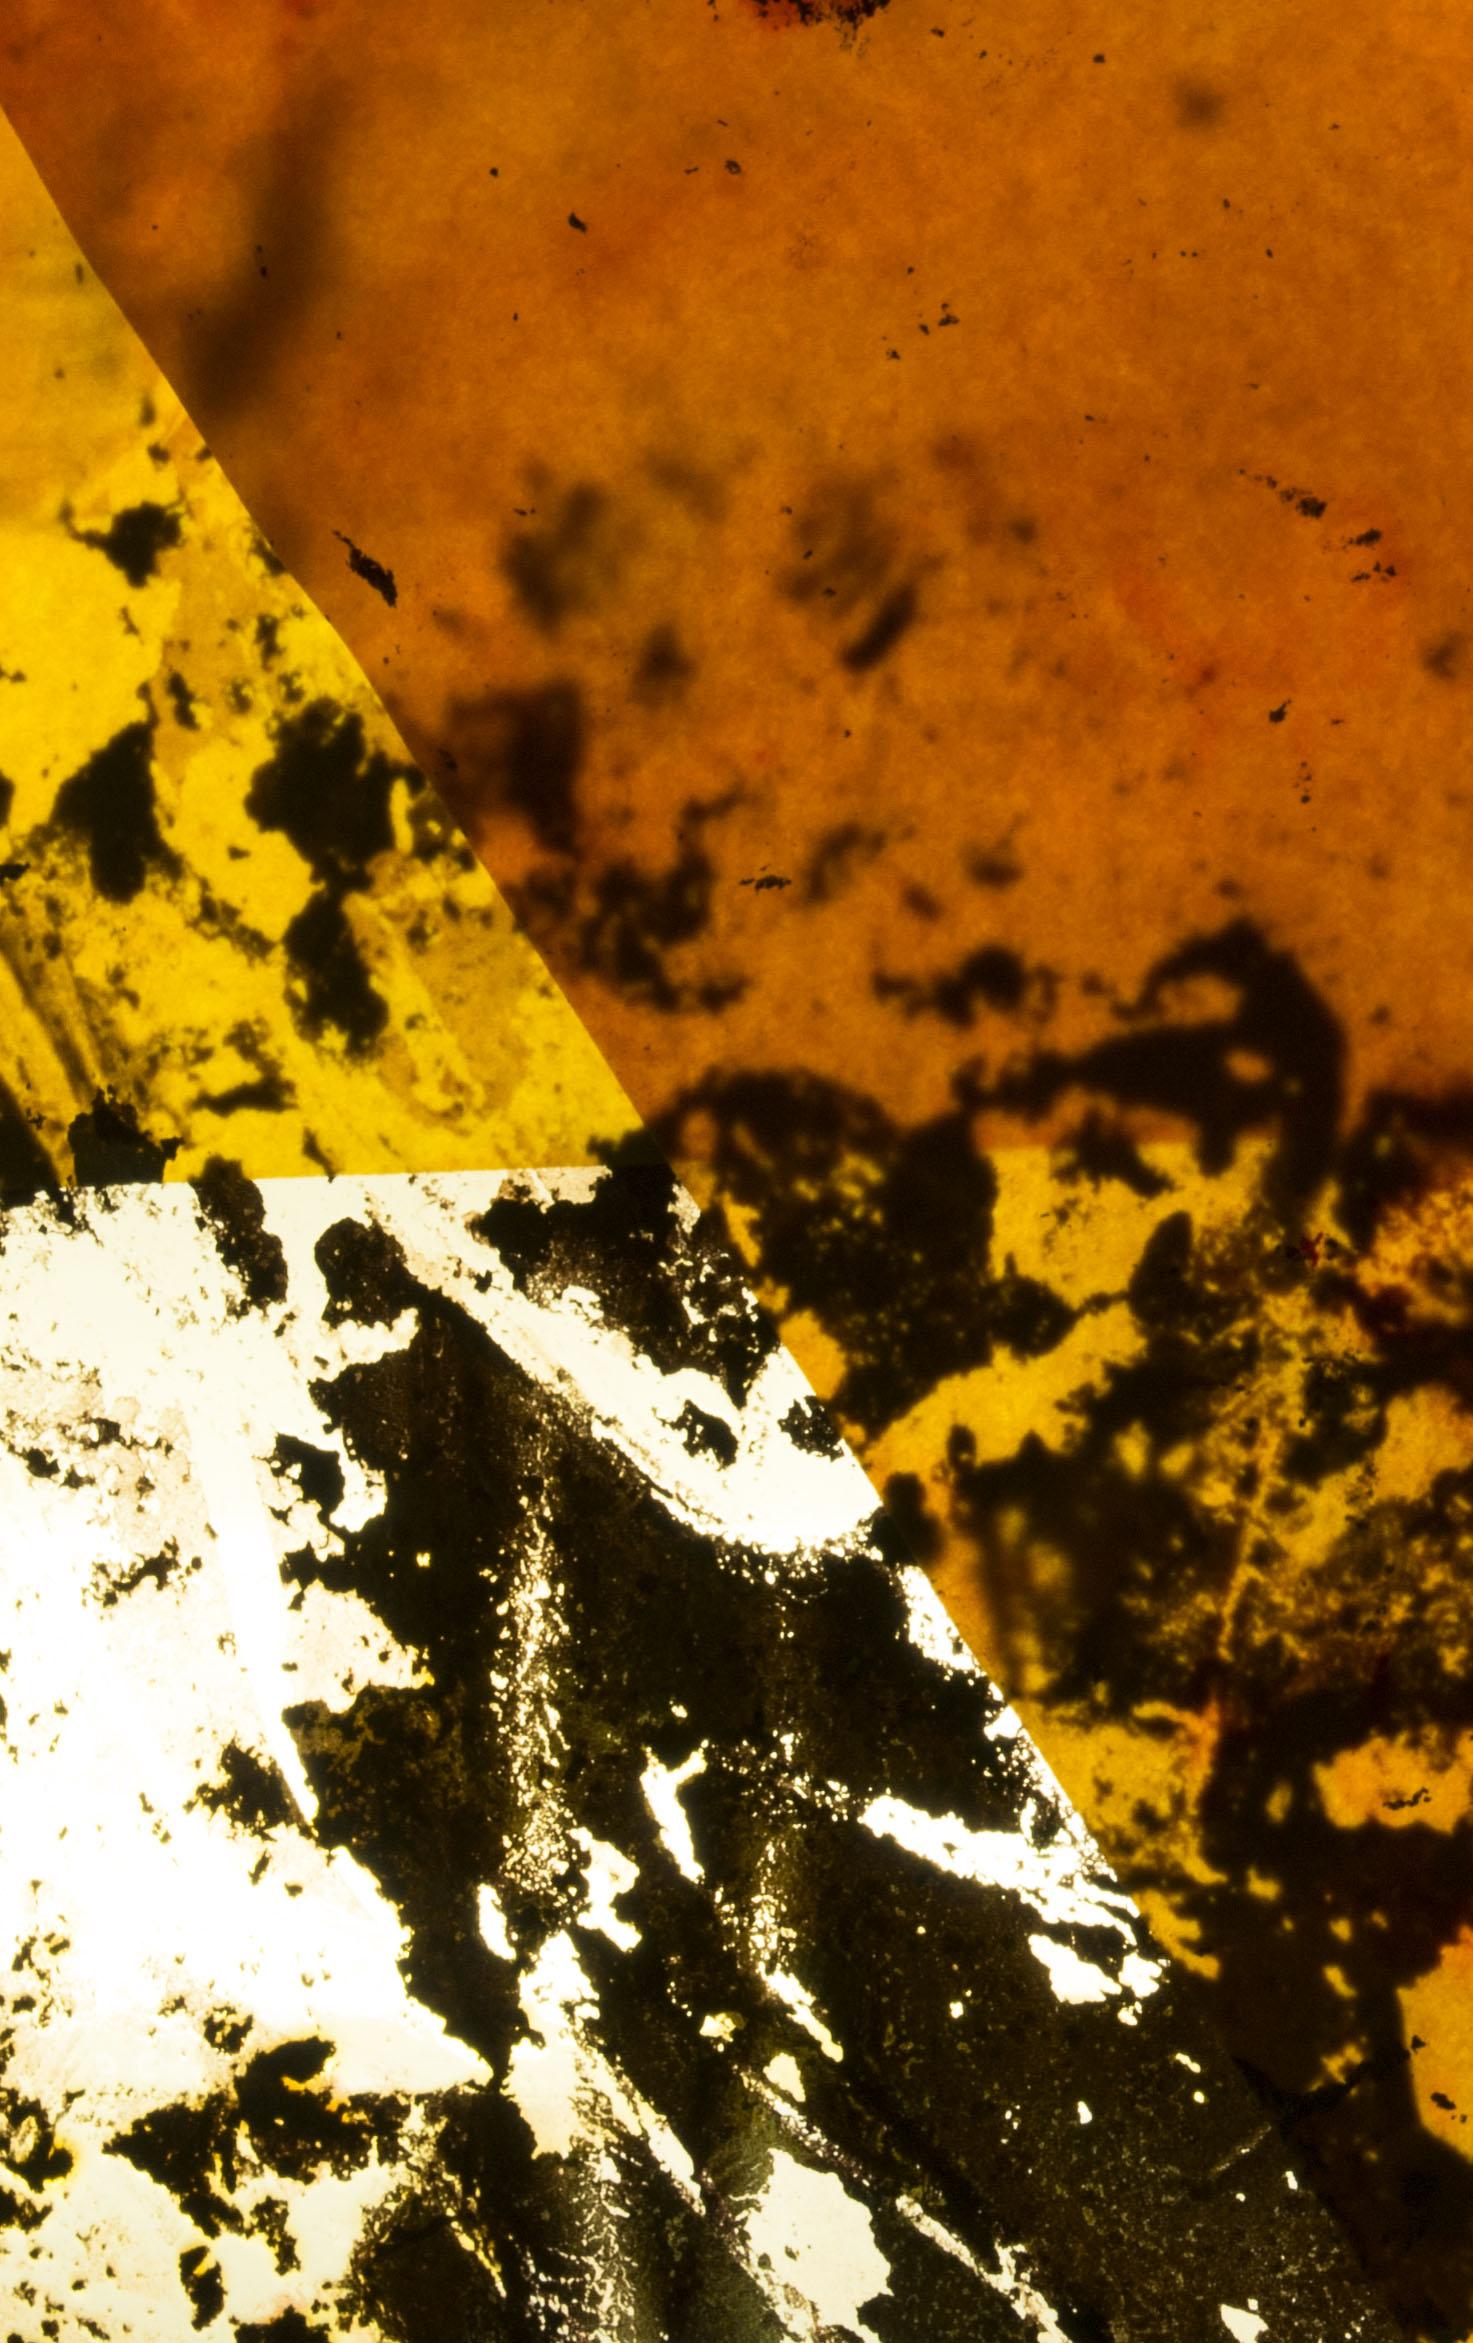 Abstract - Photography - Koen Kievits - Colors - Experiment - Illusion - Art.jpg